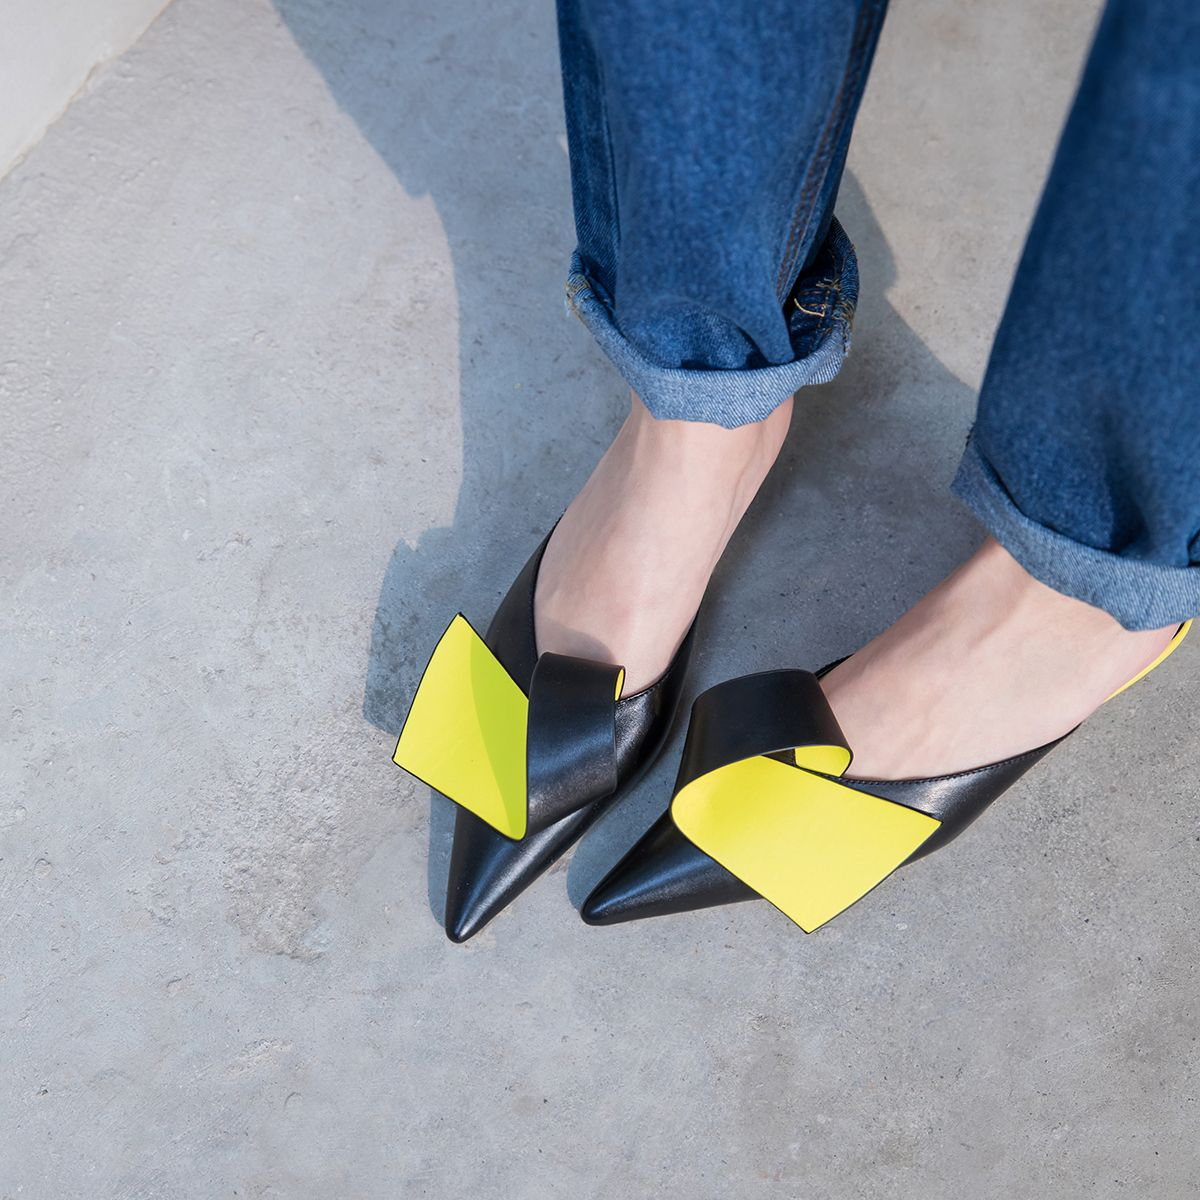 Locus Kima Attitude Slip On Mules Kitten Heels Price 76 00 Free Standard Tracked Shipping Worldwide Locus Locusbou Womens Shoe Store Women Shoes Shoe Boutique